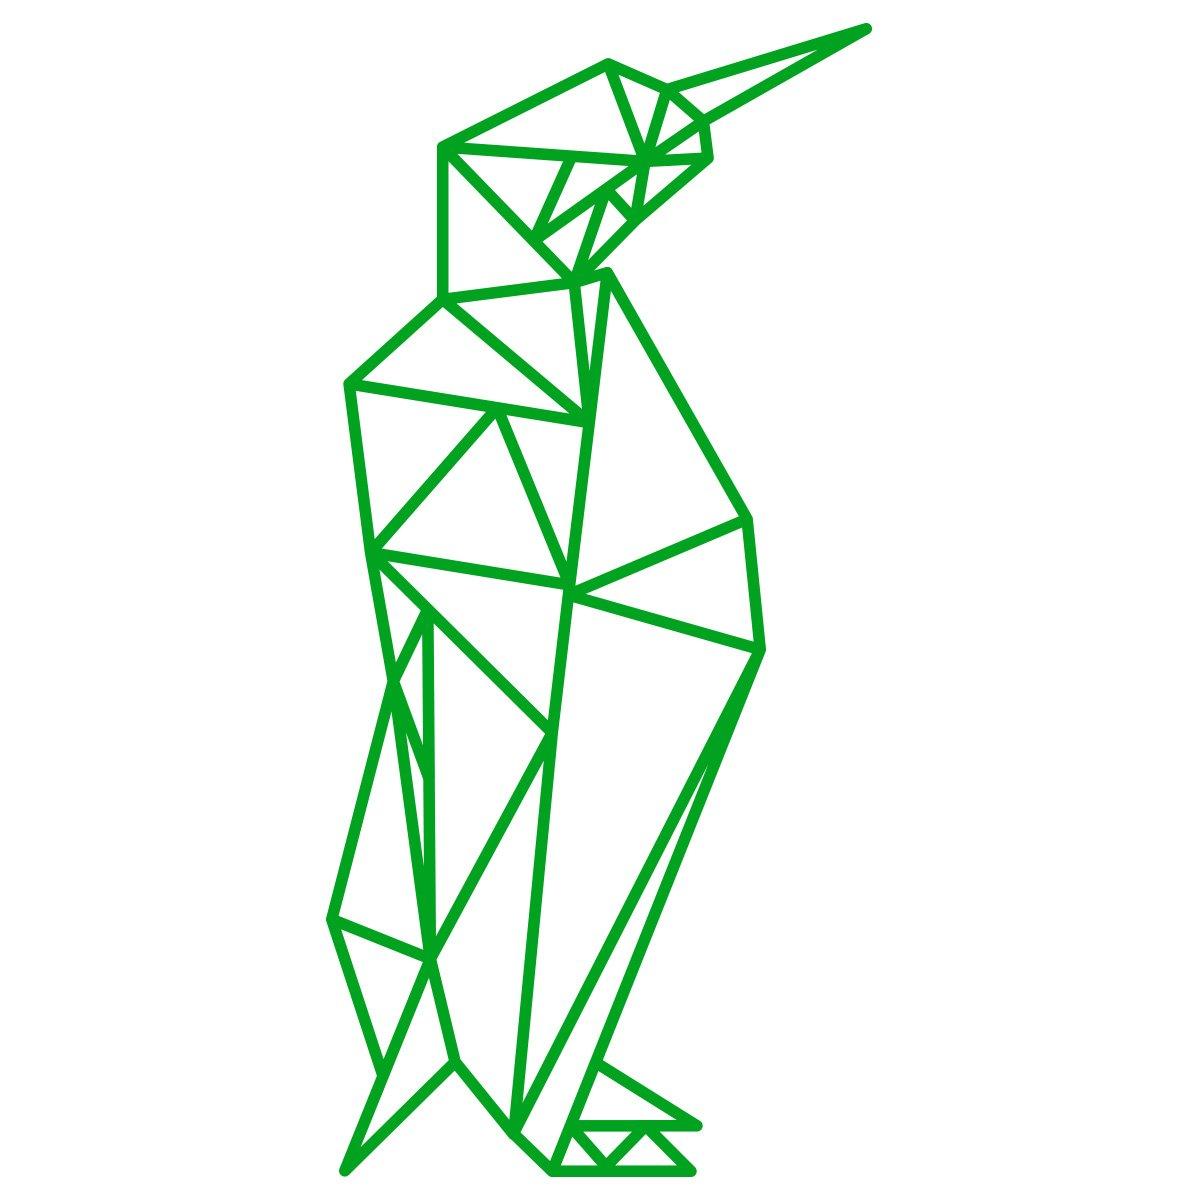 WANDKINGS Wandtattoo - Origami-Style Pinguin - 52 x 110 cm - HellRosa - Wähle aus 5 Größen & 35 Farben B07C9H39HL Wandsticker & Wandfiguren